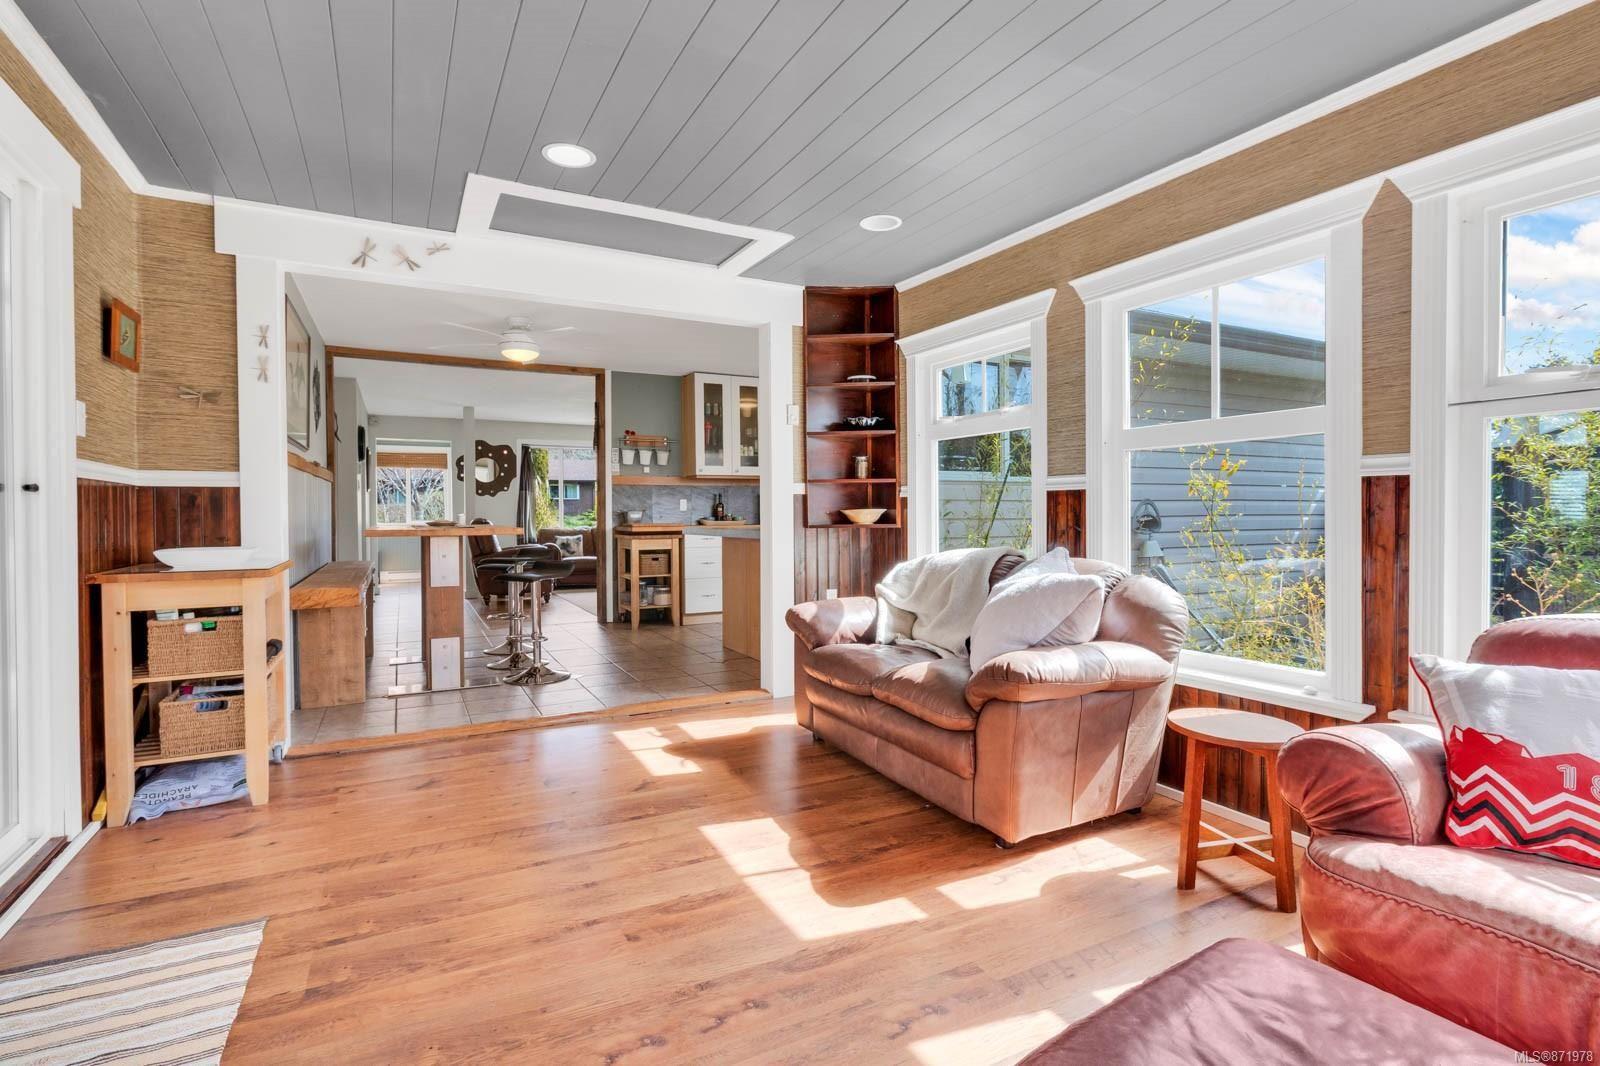 Photo 6: Photos: 1539 Chilcotin Cres in : CV Comox (Town of) House for sale (Comox Valley)  : MLS®# 871978